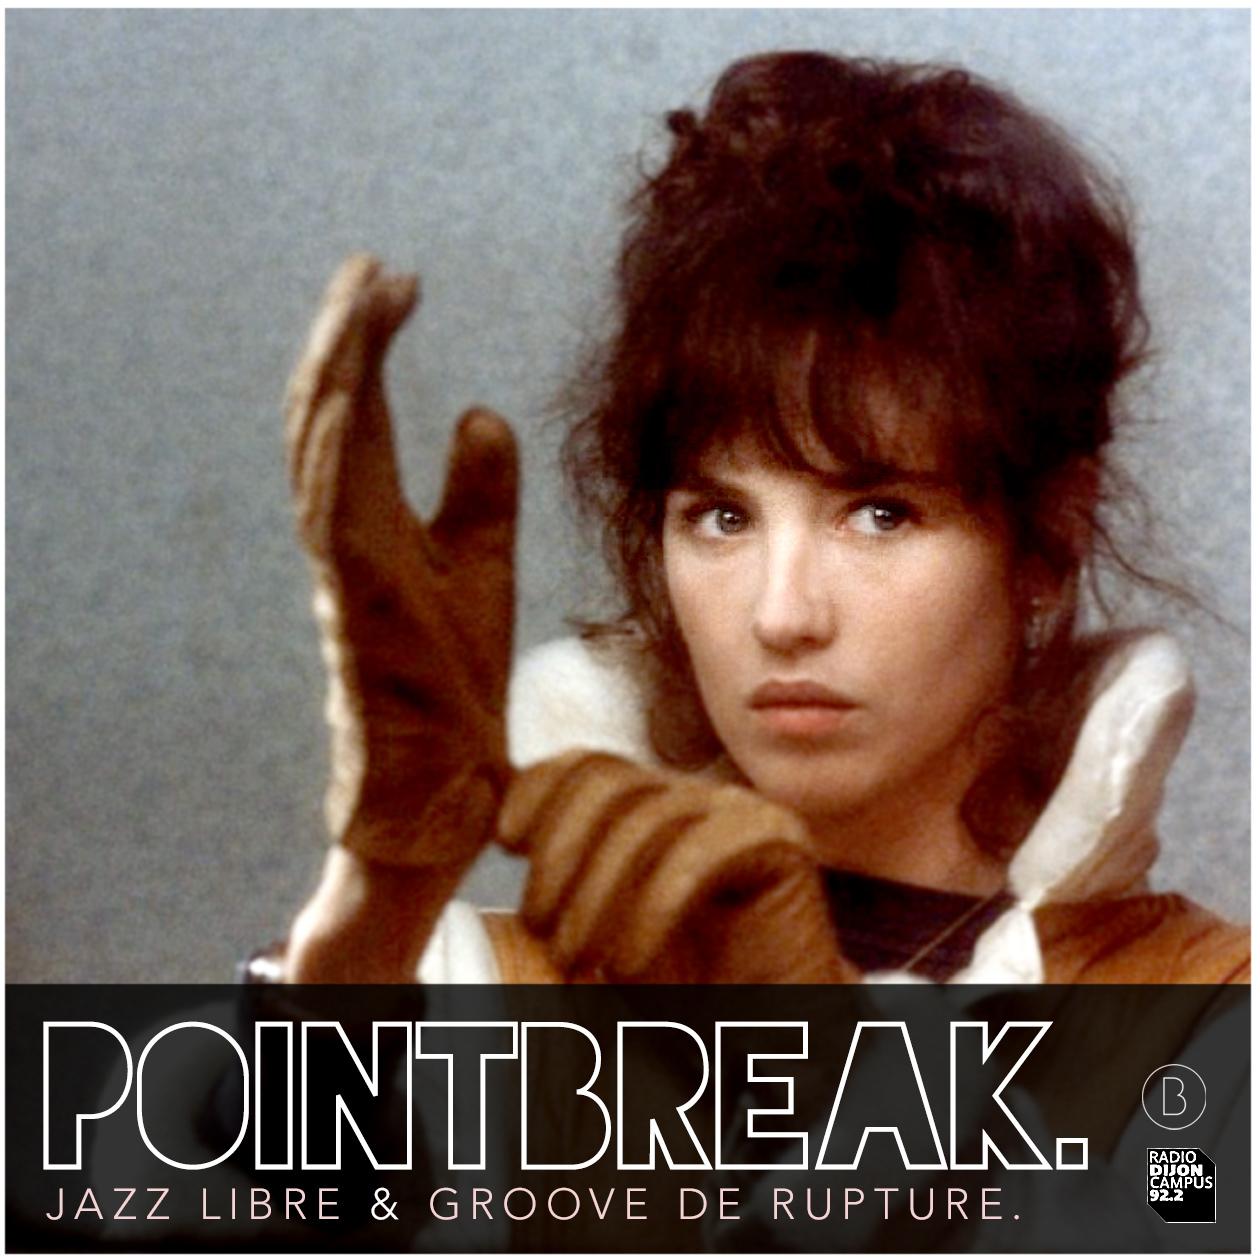 PointBreak, Radio Mix S03 E02